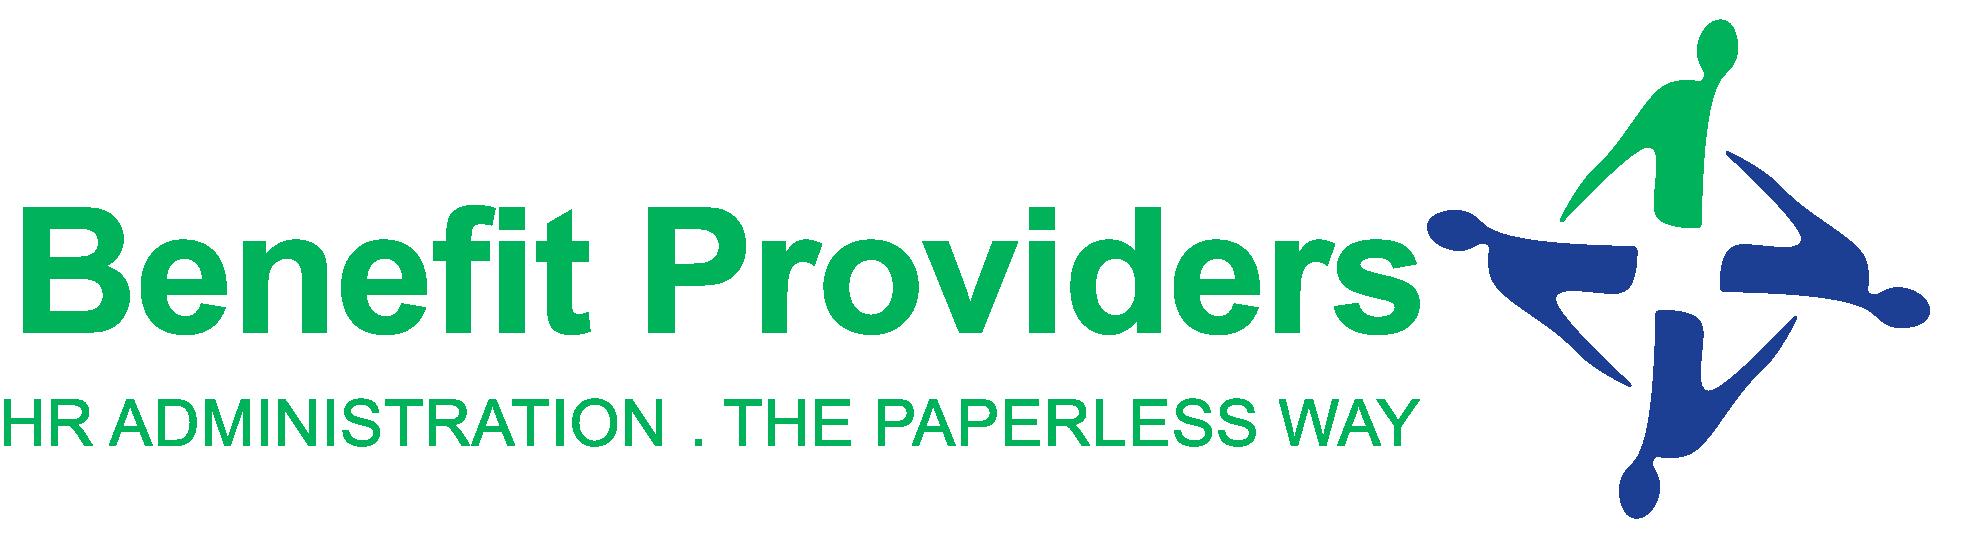 Benefit Providers